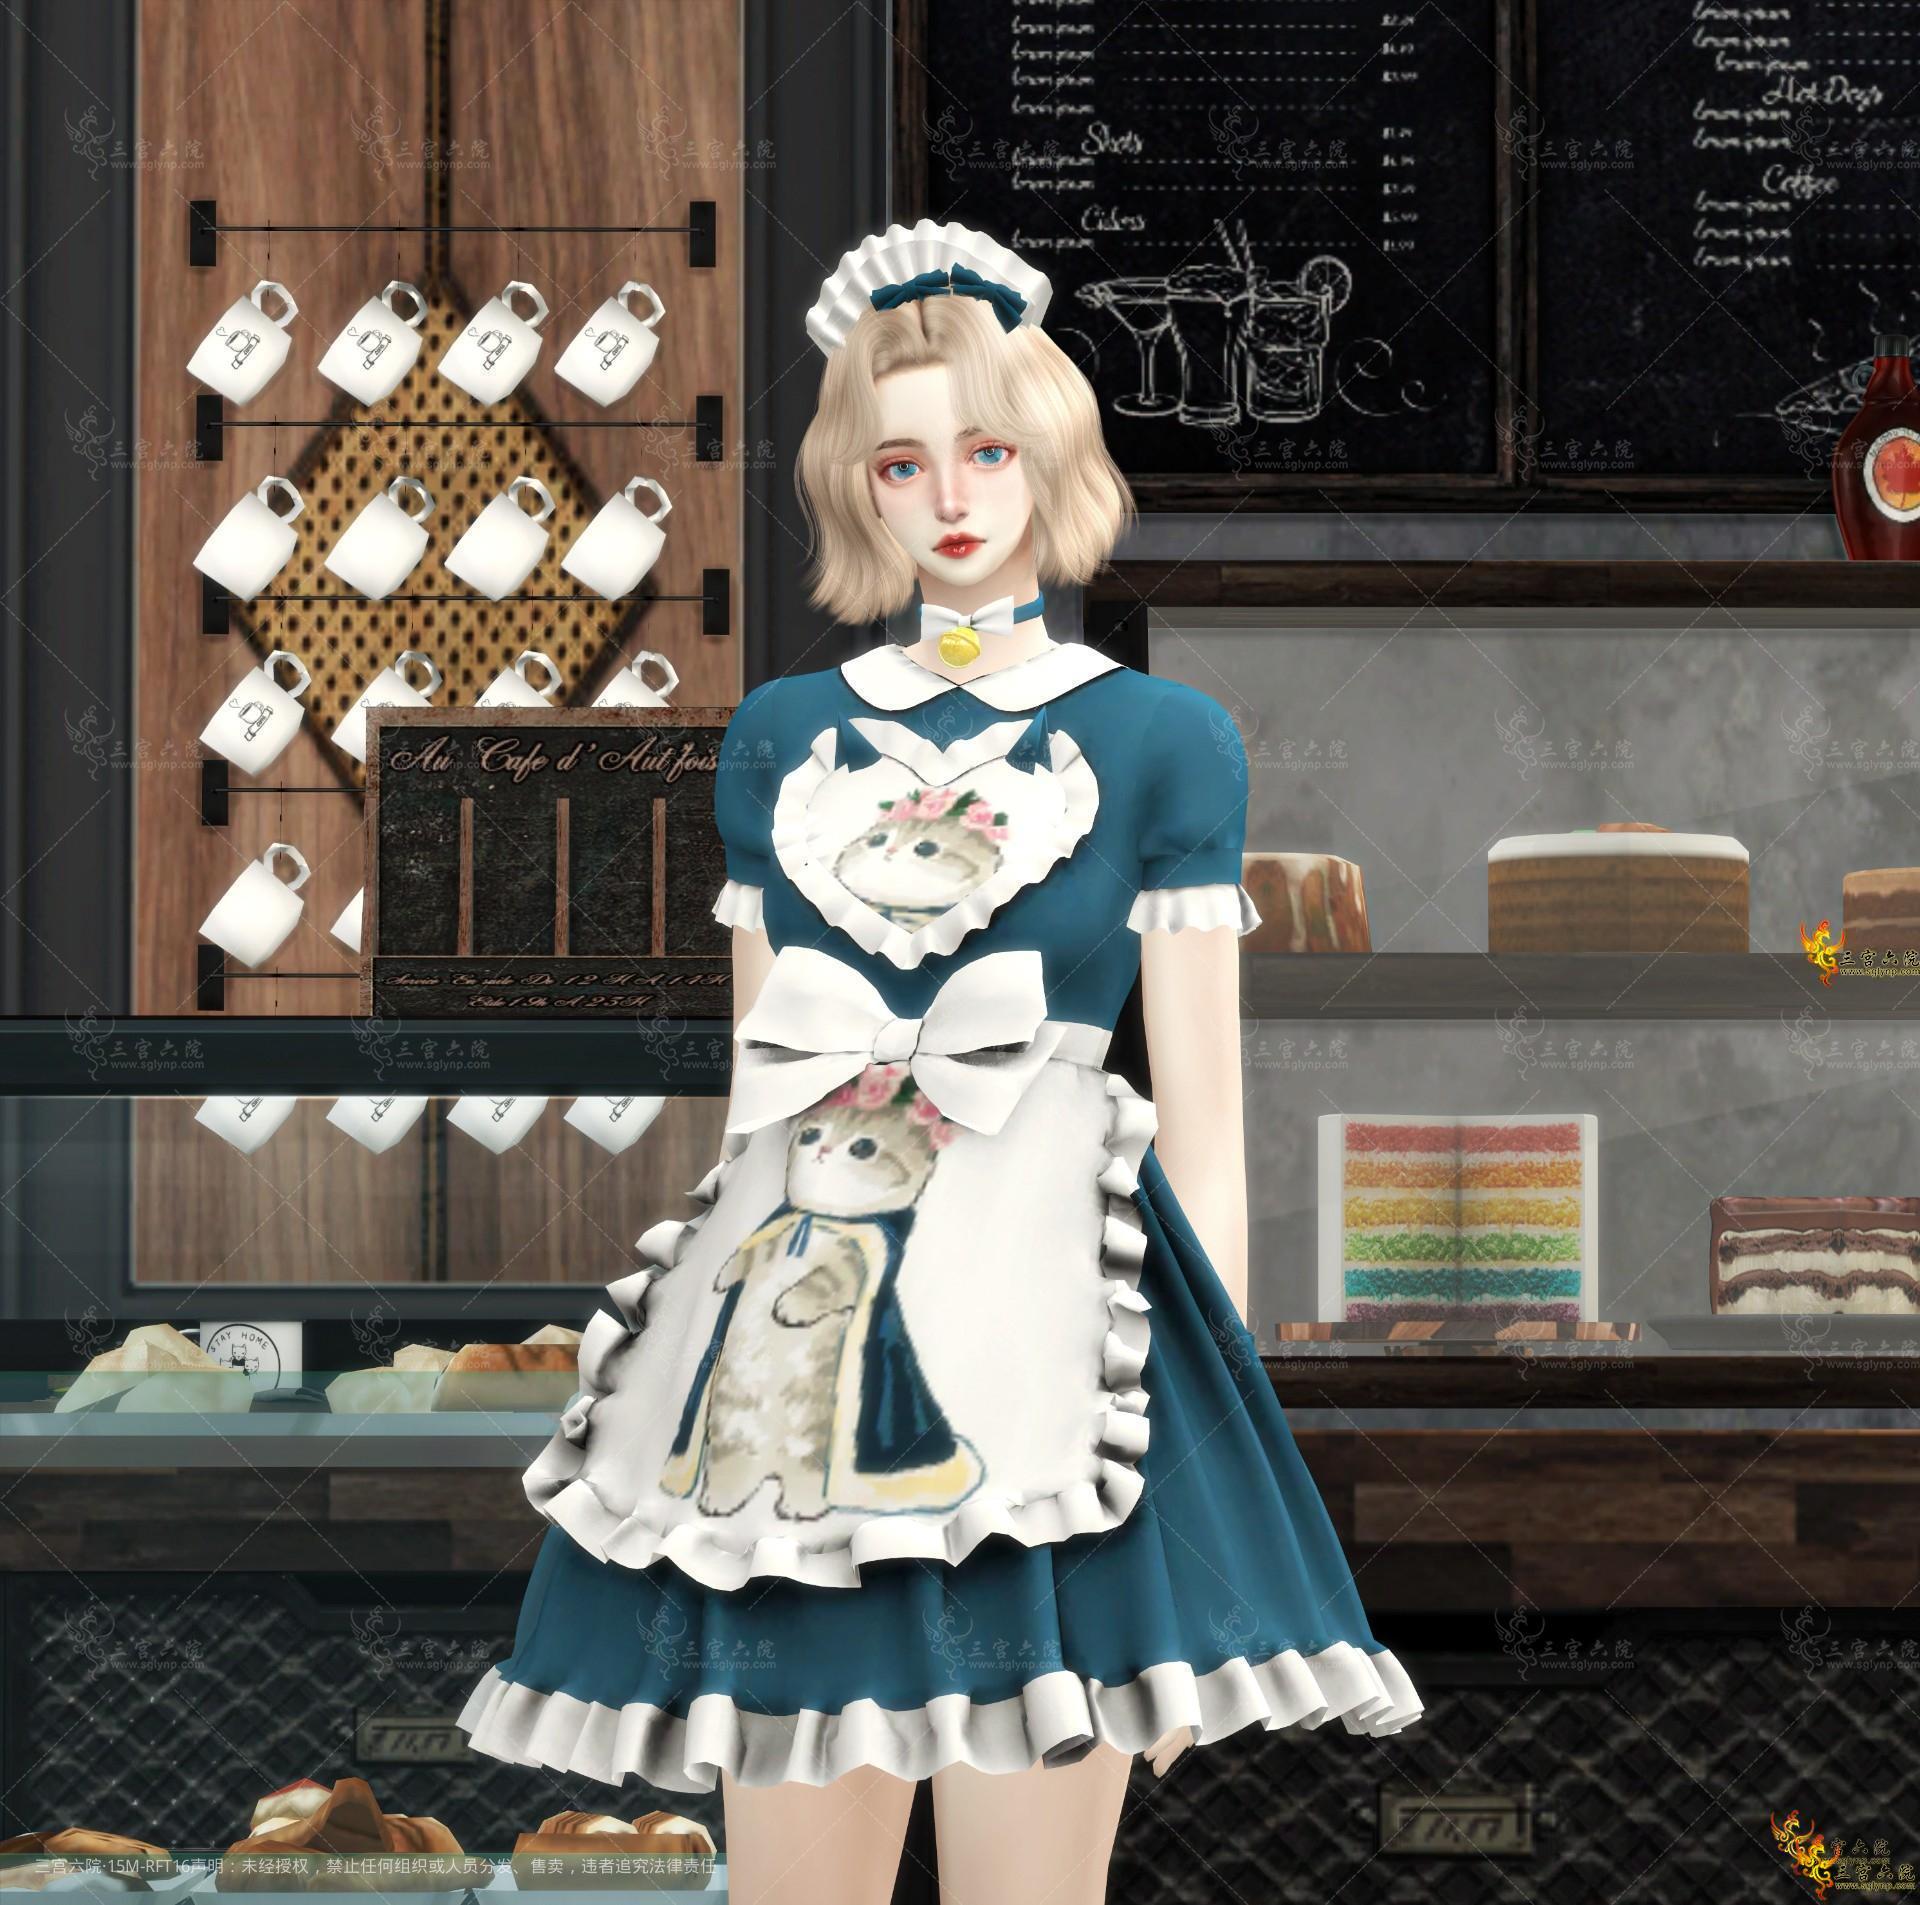 【Xsims】女仆猫套装